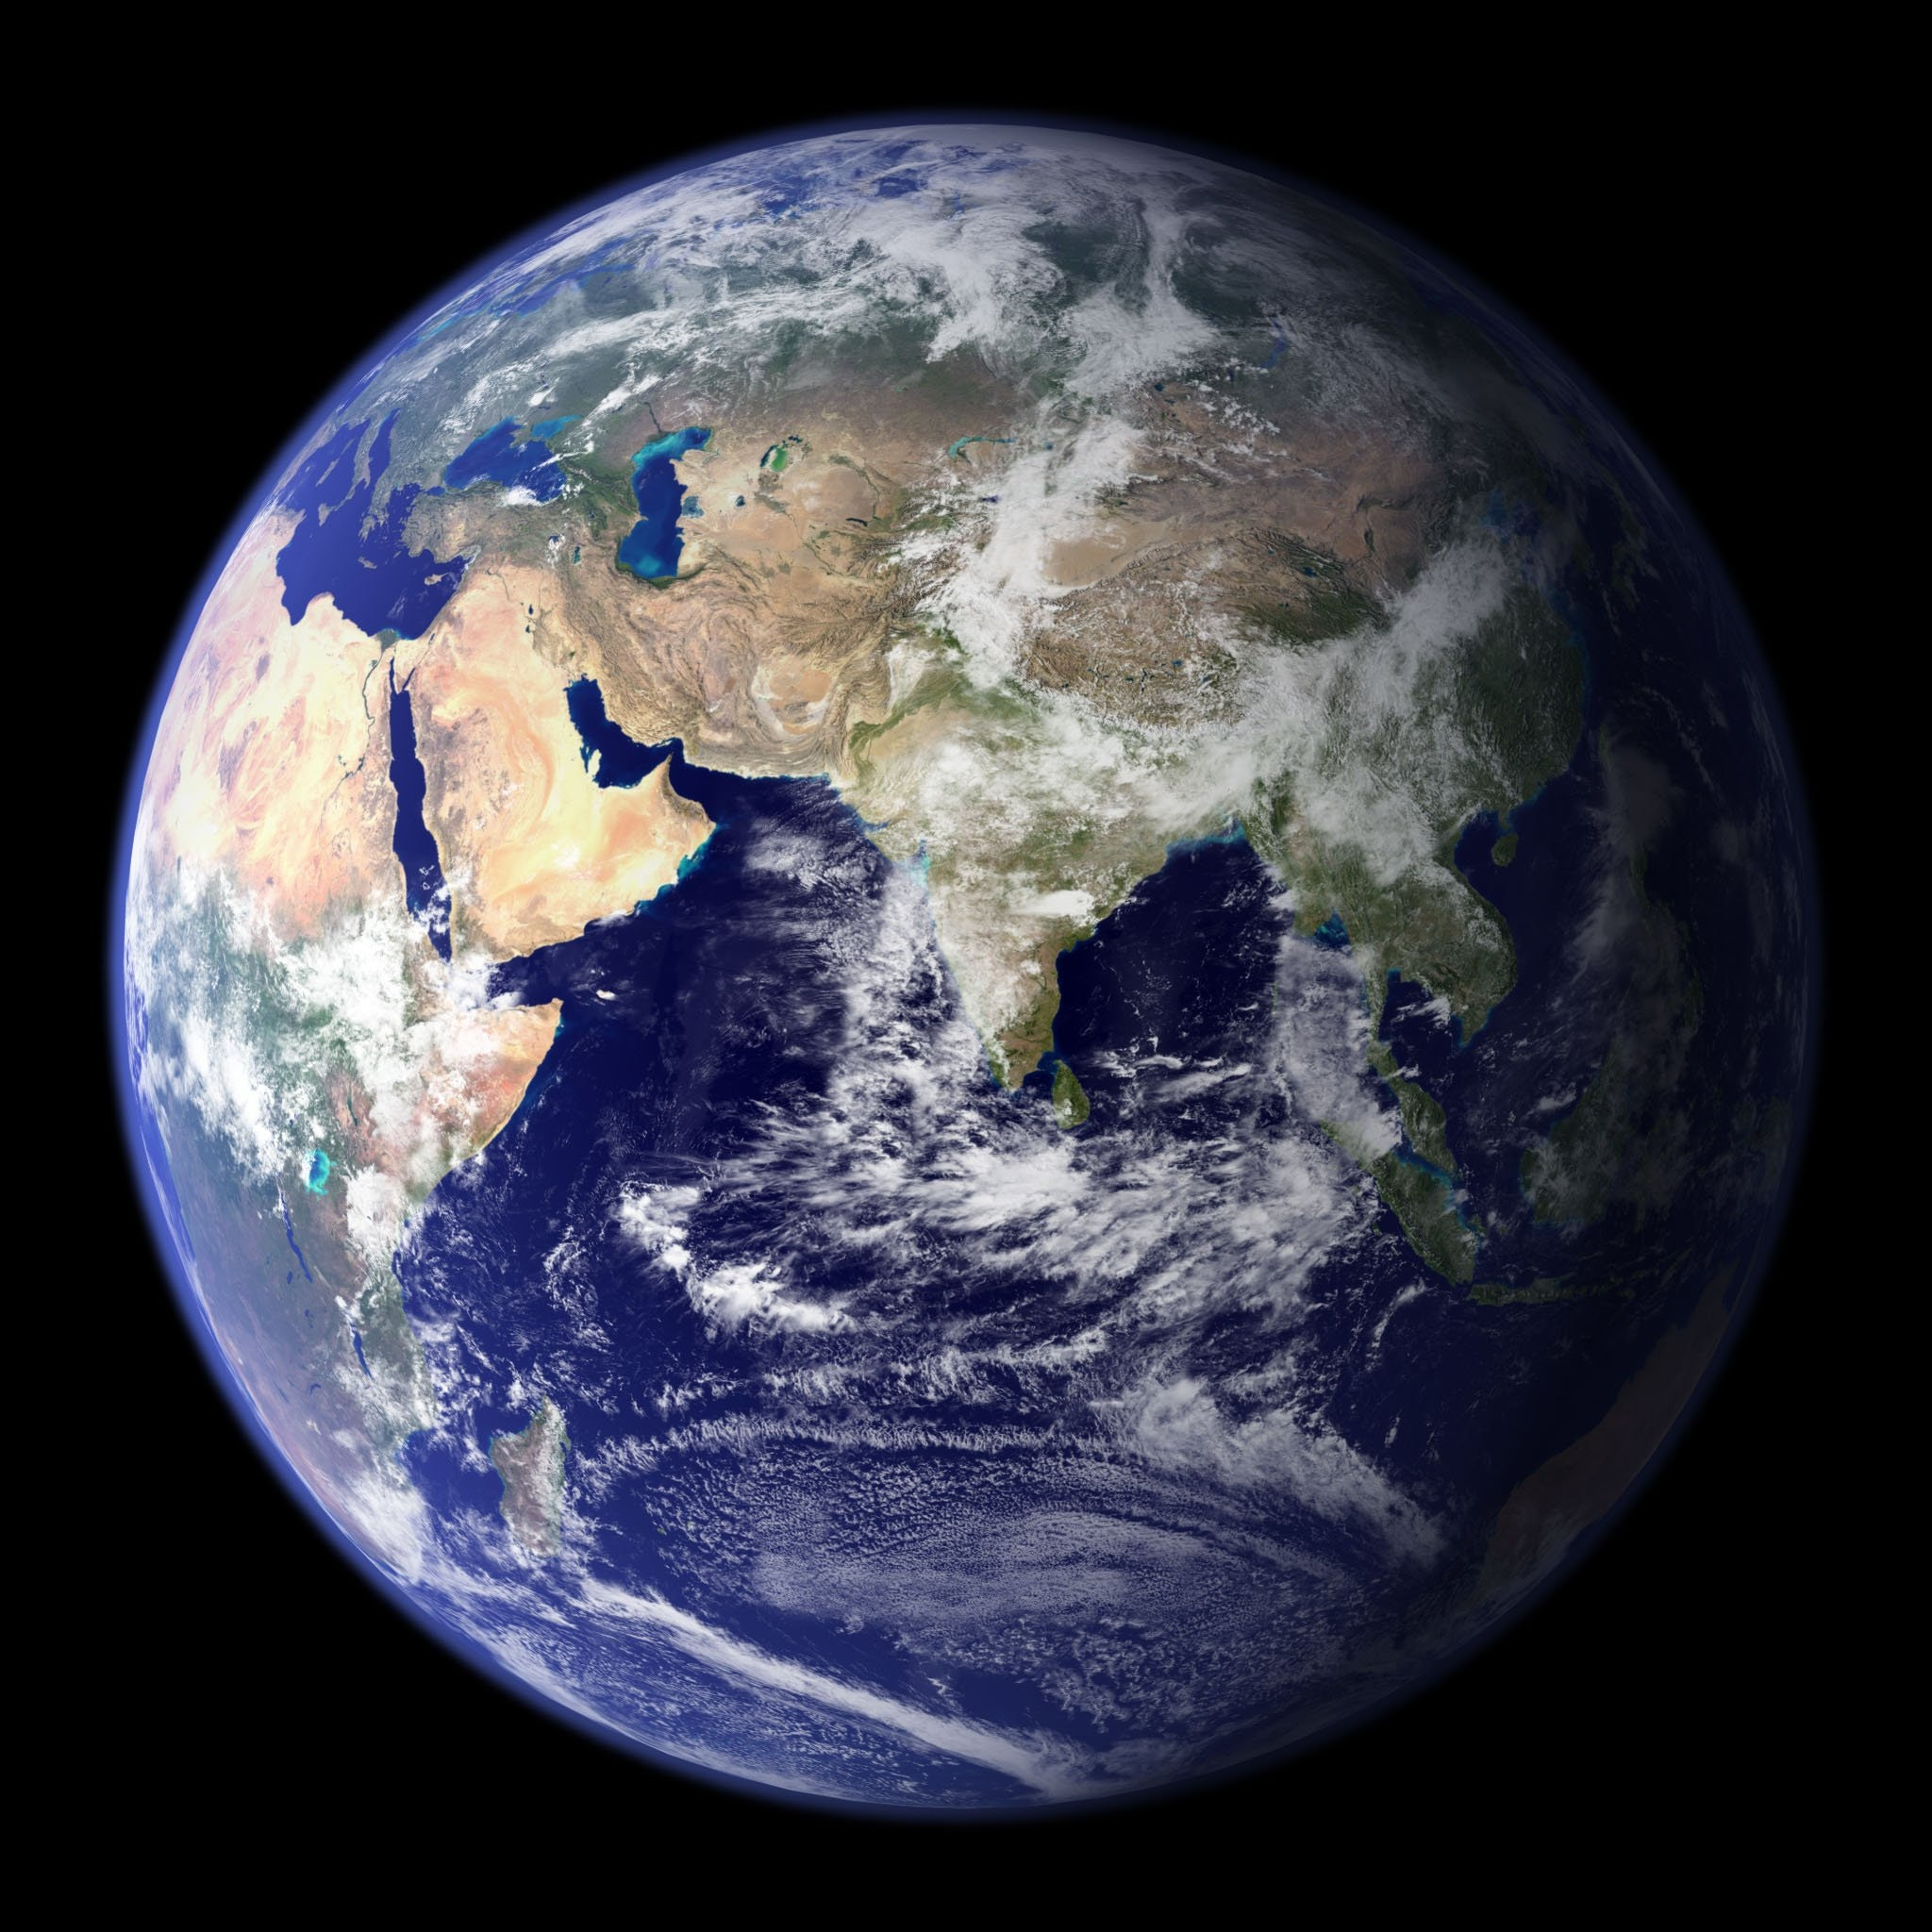 Earth Wallpaper · Free Stock Photo